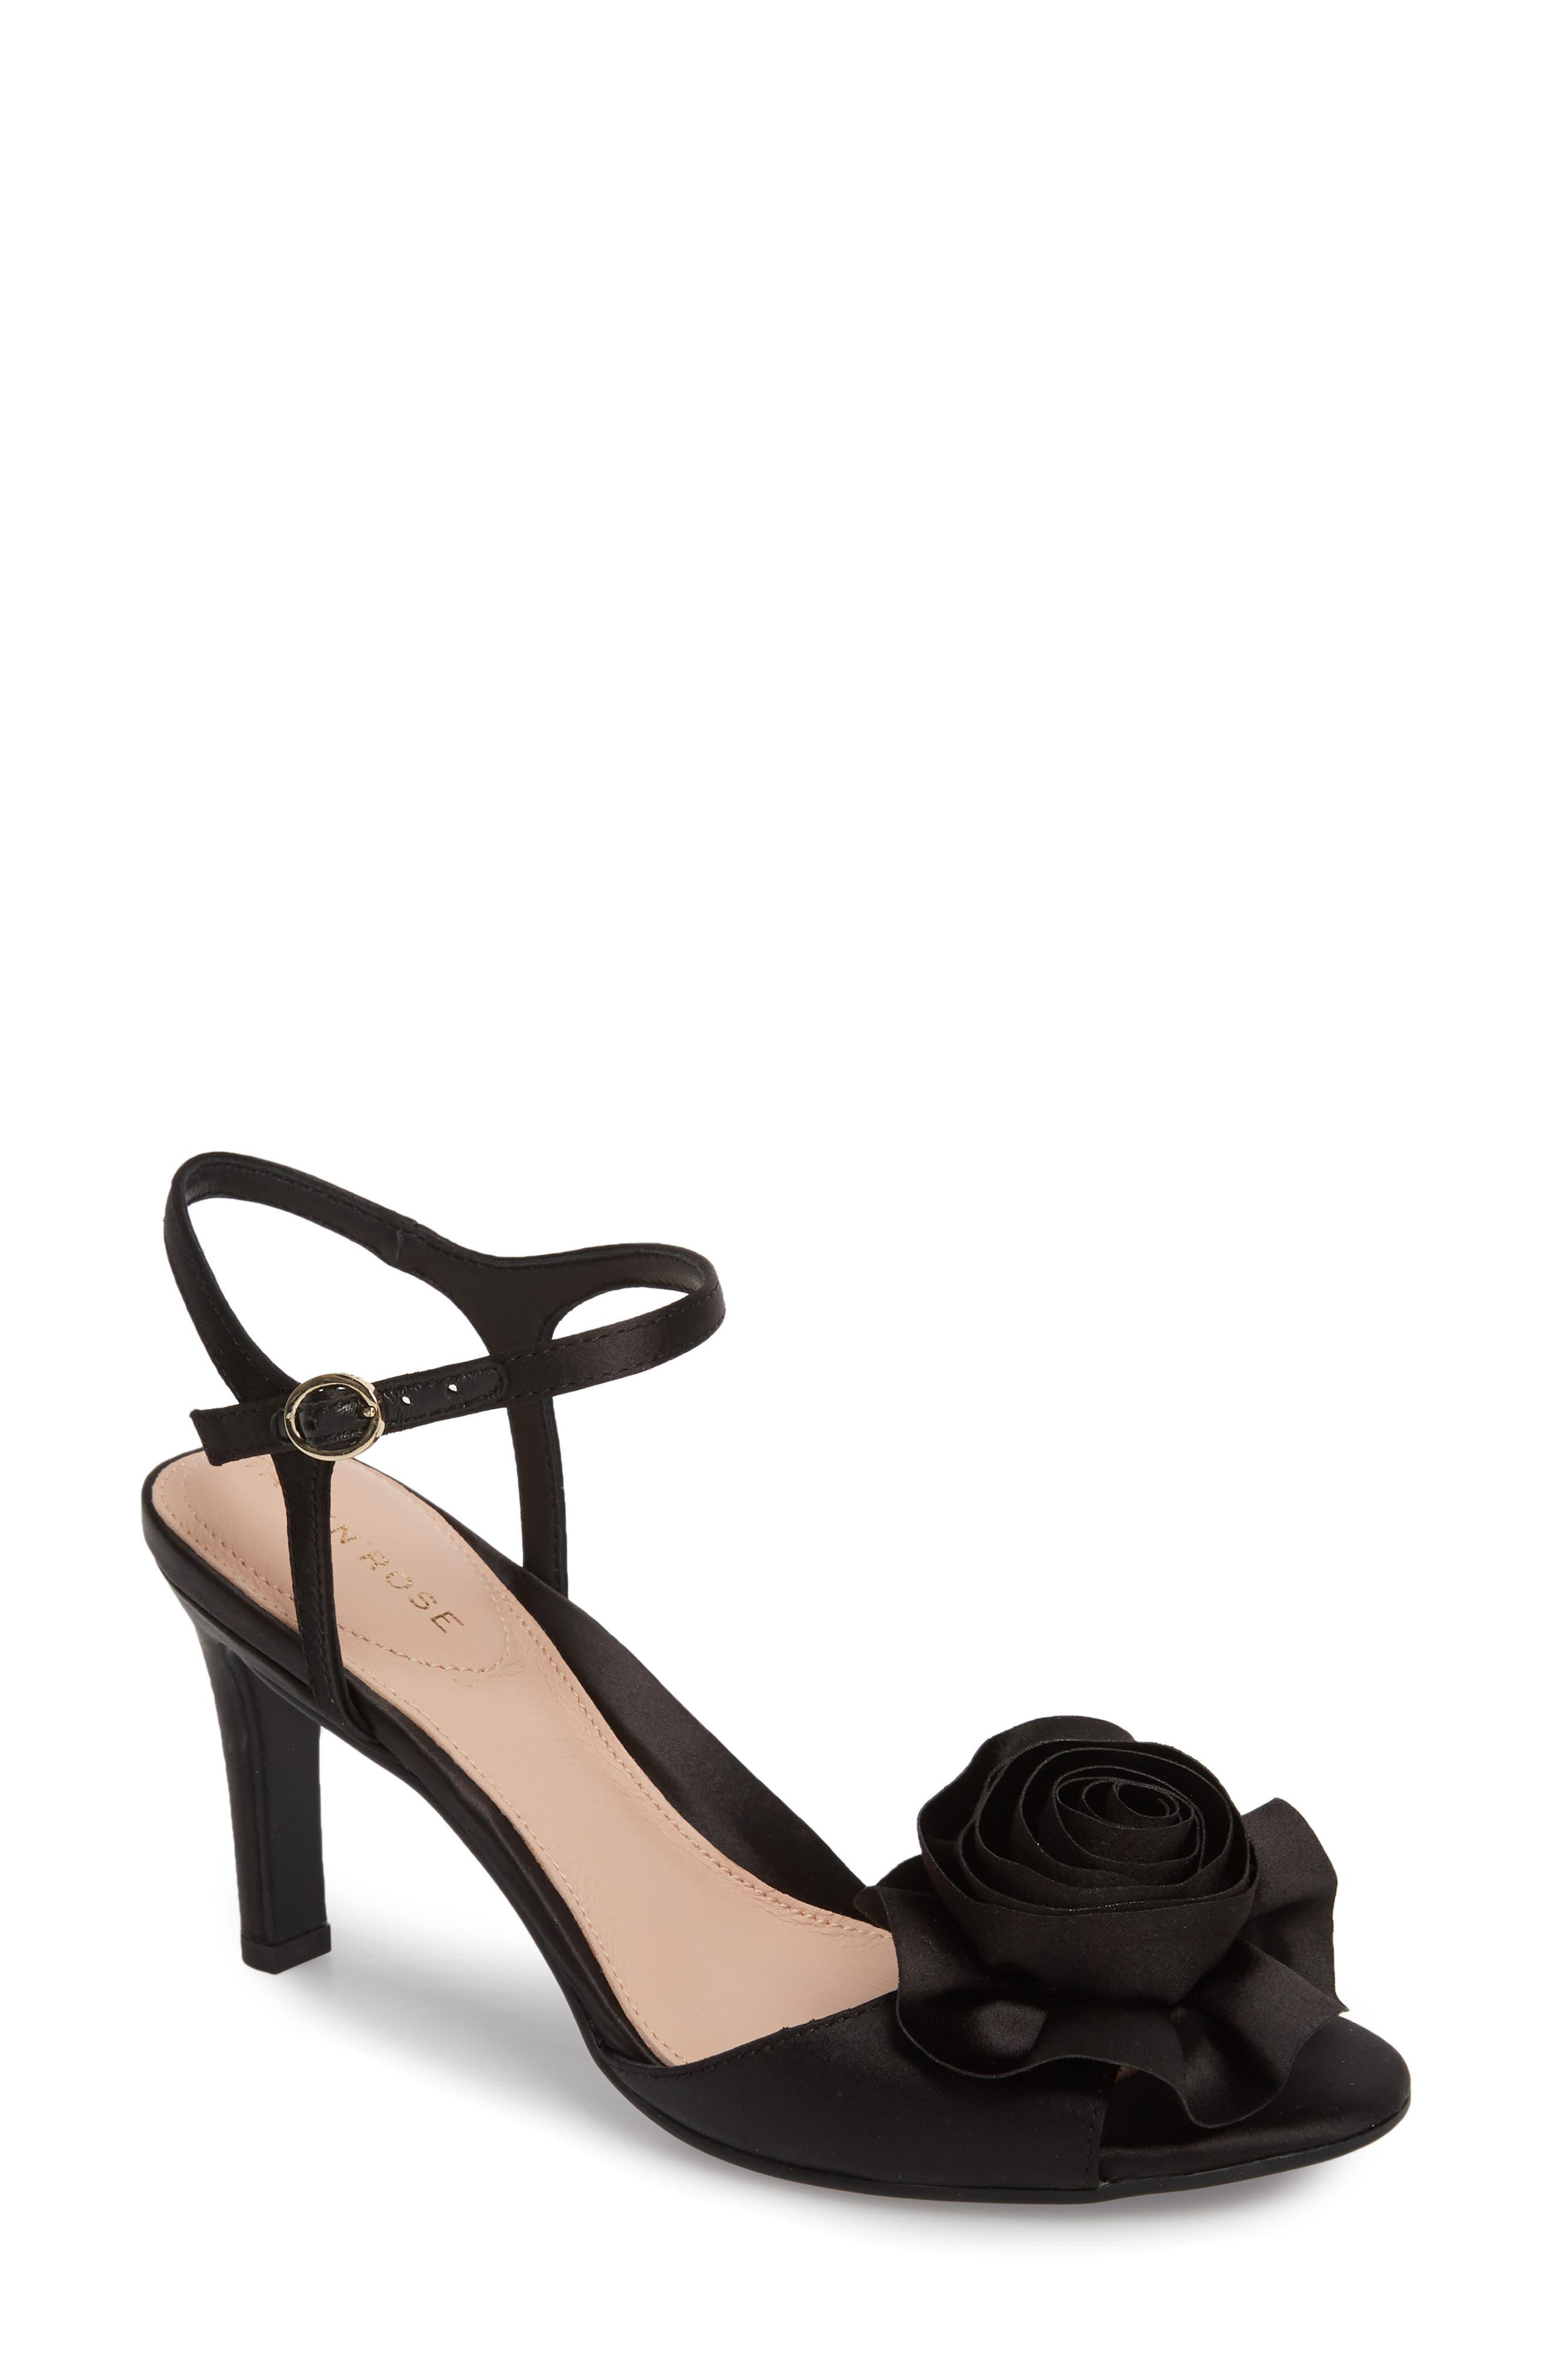 Jacklyn Flower Sandal,                         Main,                         color, BLACK SHIMMER FABRIC